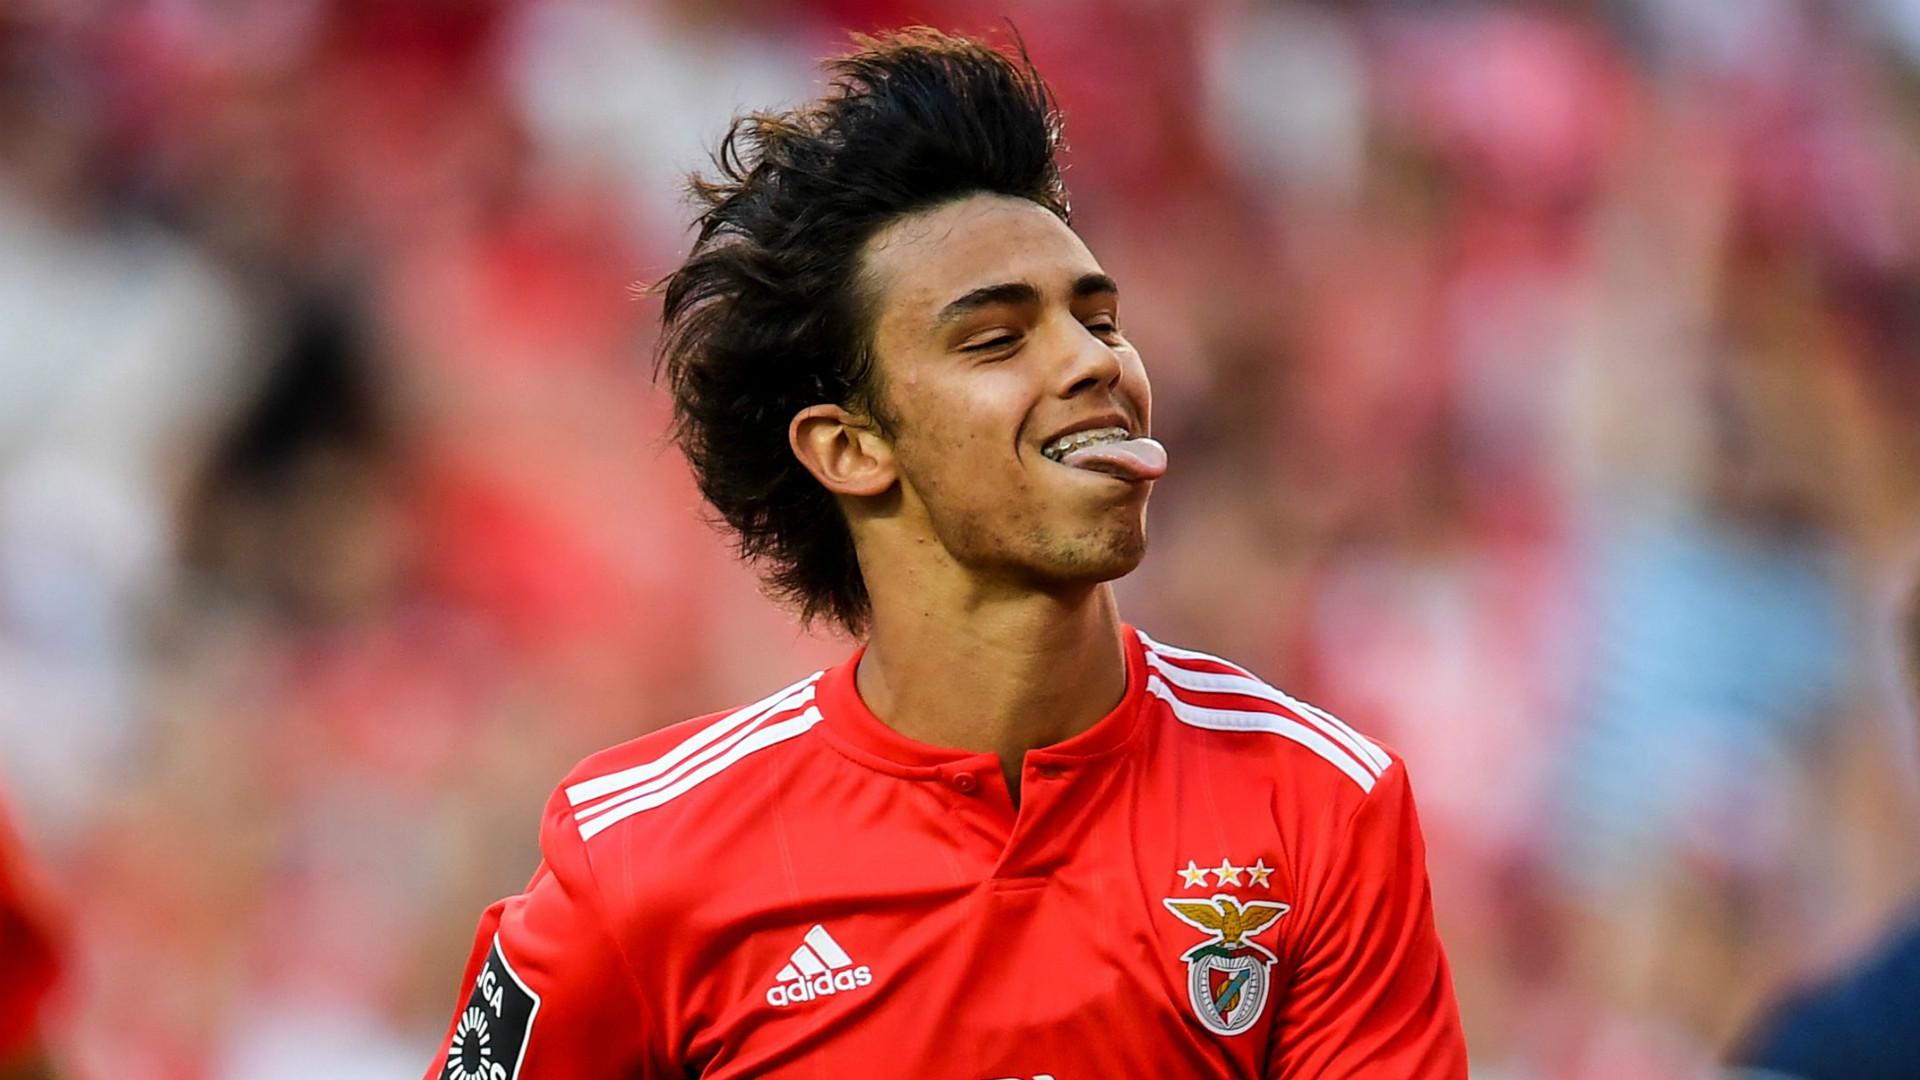 Liverpool reportedly make €70m bid for Joao Felix